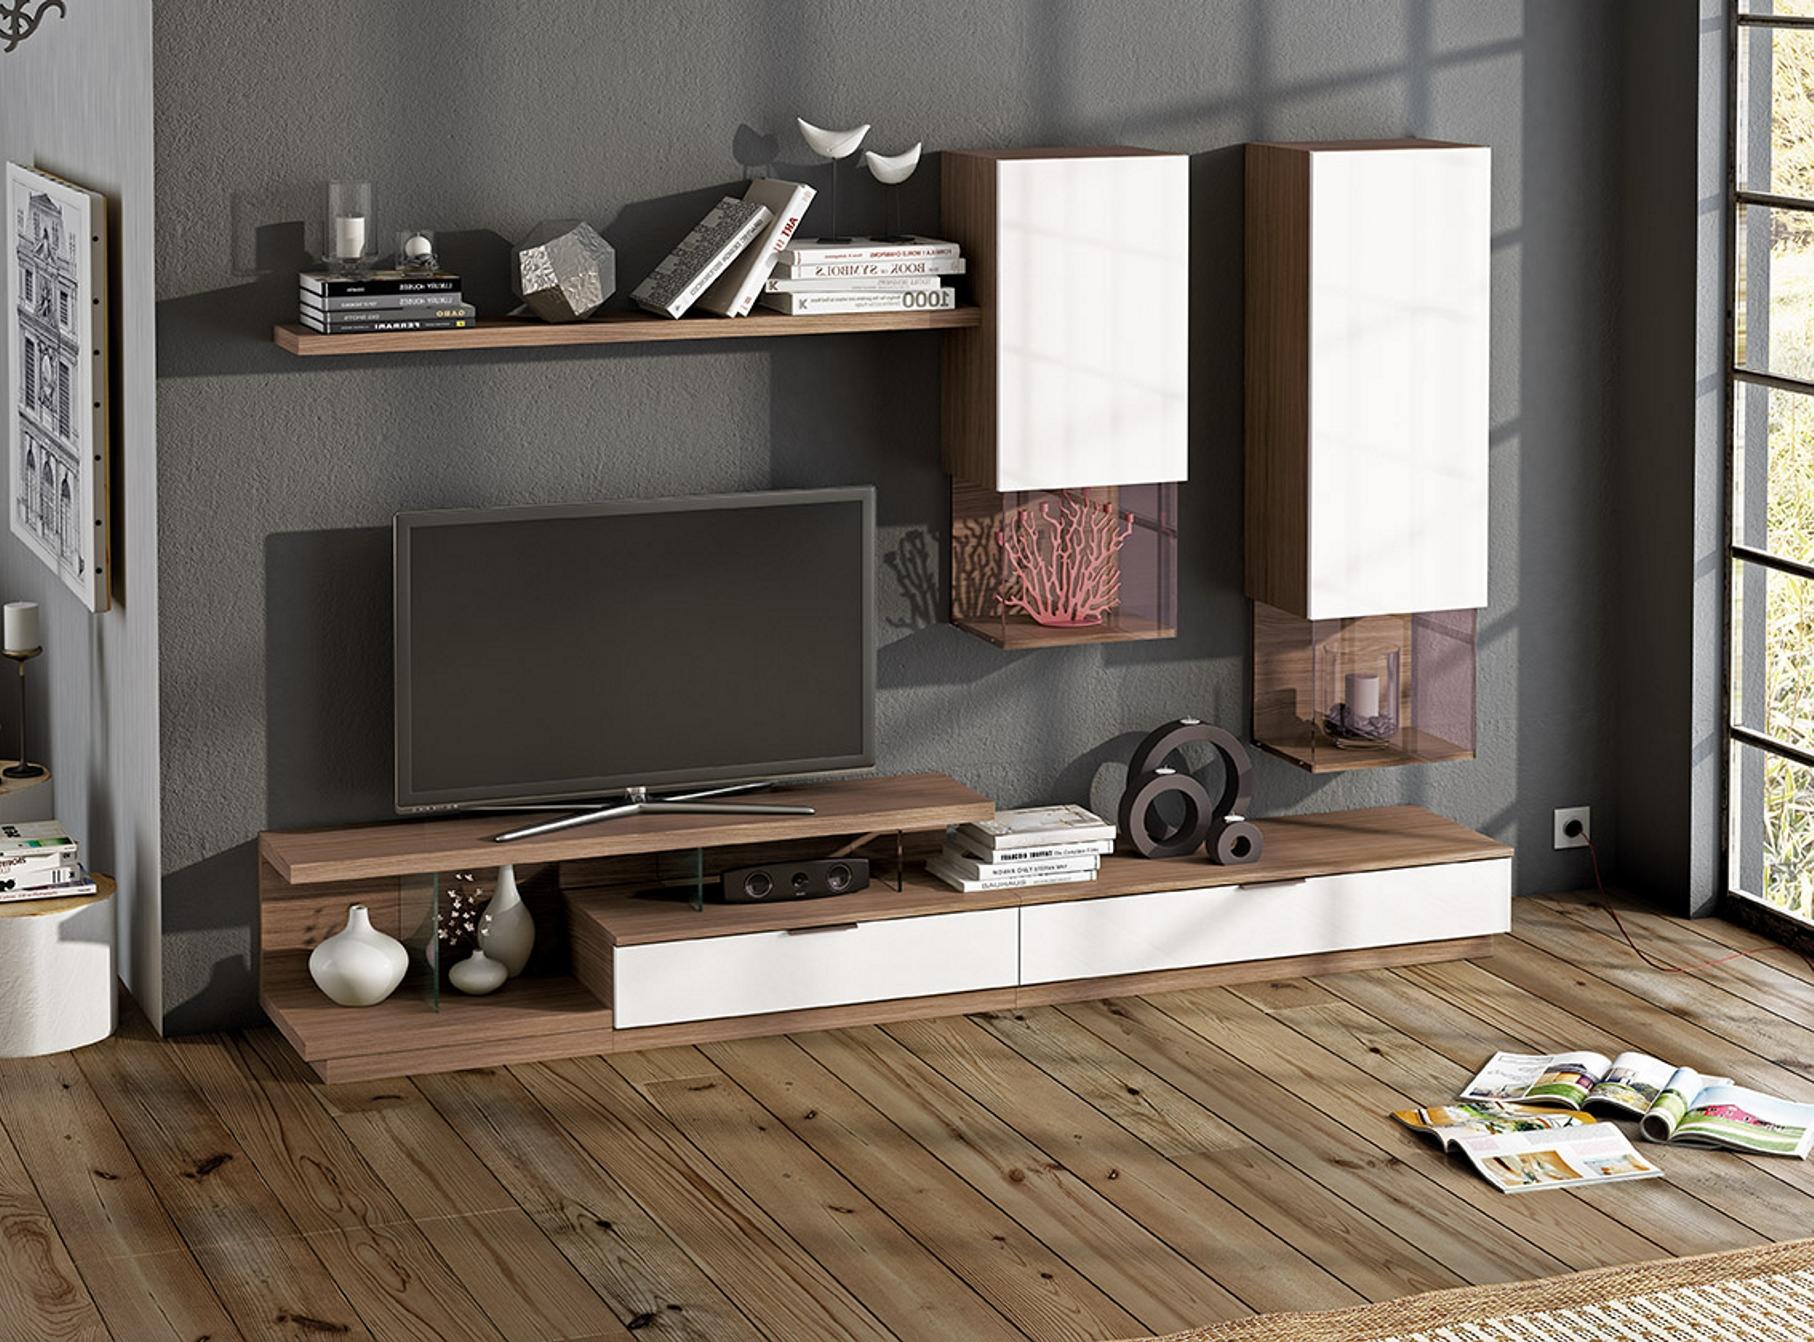 salon-moderno-Zion-3.0-muebles-paco-caballero-0907-5c8d32e95fedc